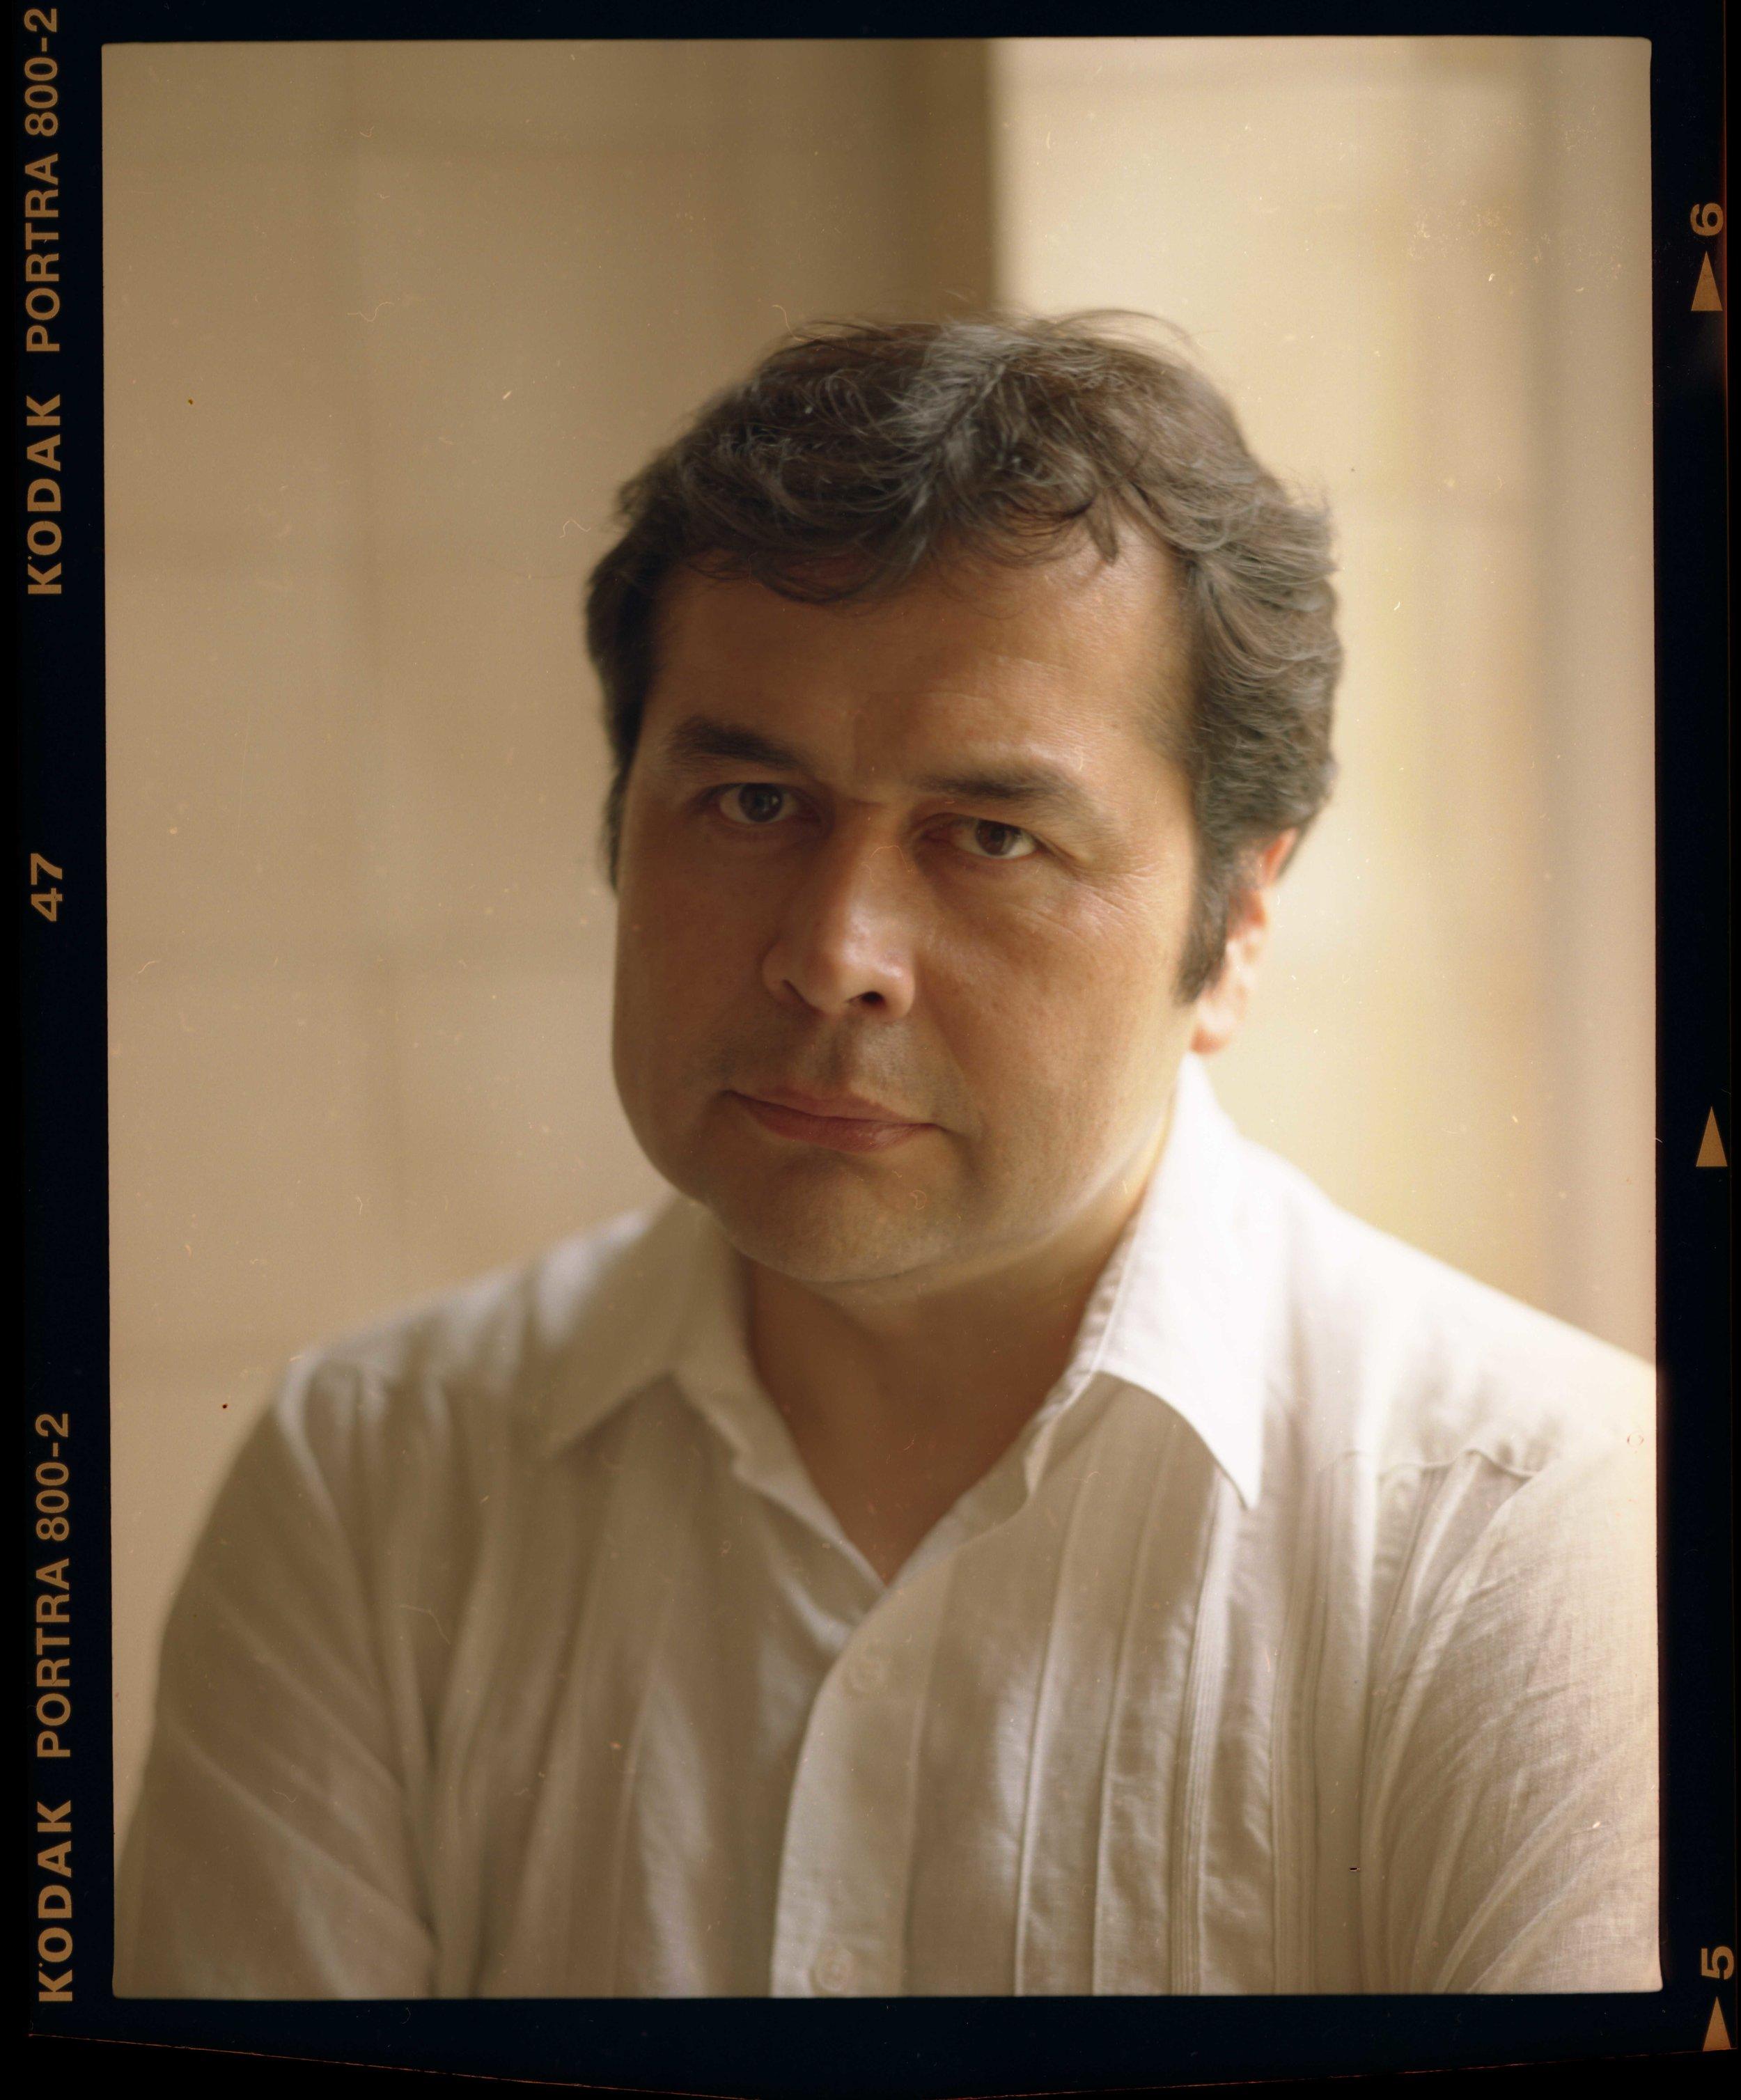 Interview with a Screenwriter No. 1 - Gonzalo Maza - Screenwriter of A Fantastic Woman & Gloria